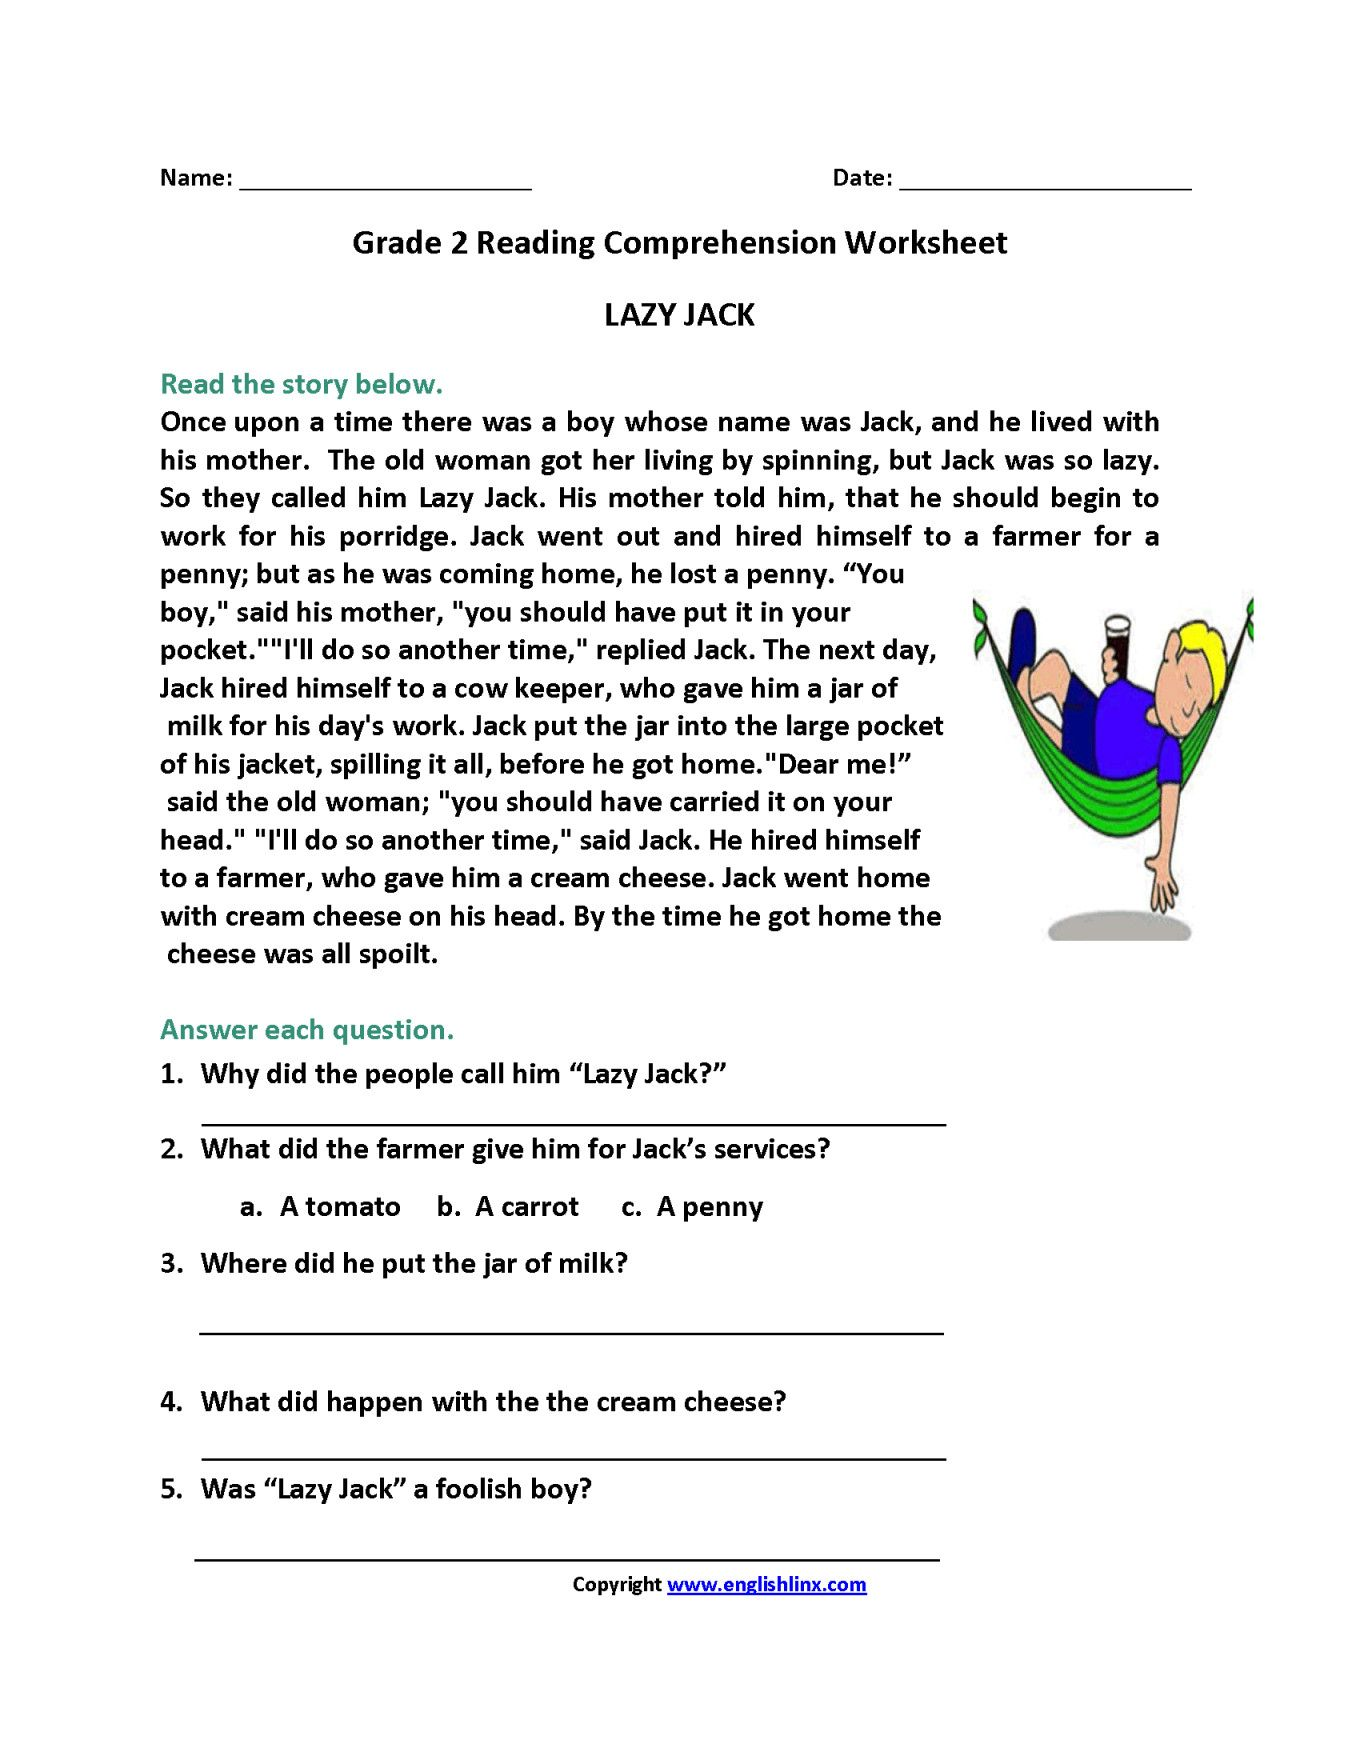 Noting Details Worksheet   Printable Worksheets and Activities for  Teachers [ 1760 x 1360 Pixel ]